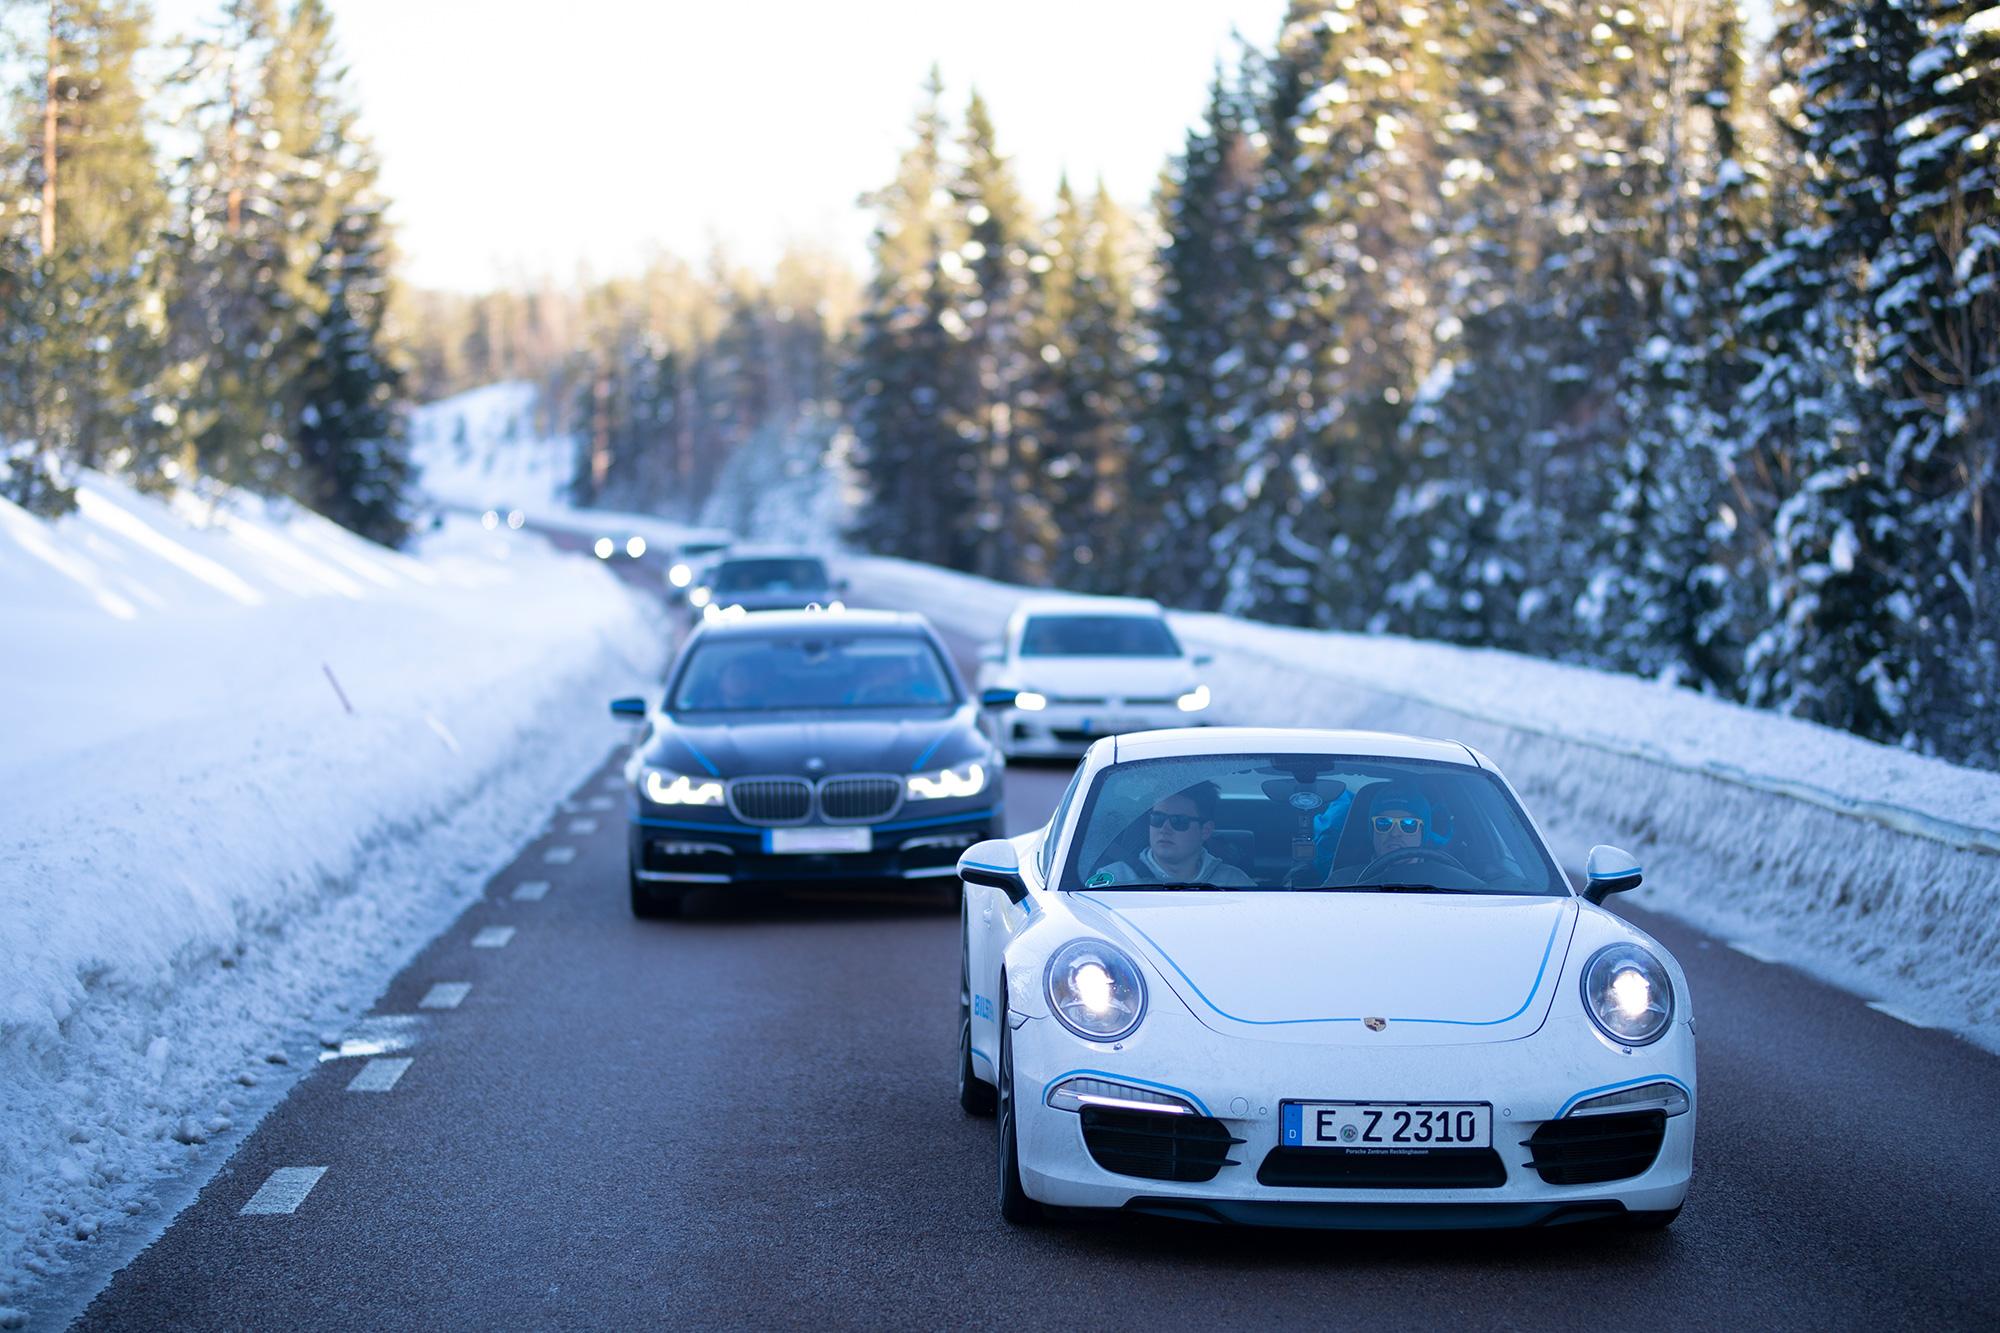 Endurance testing of automotive developments